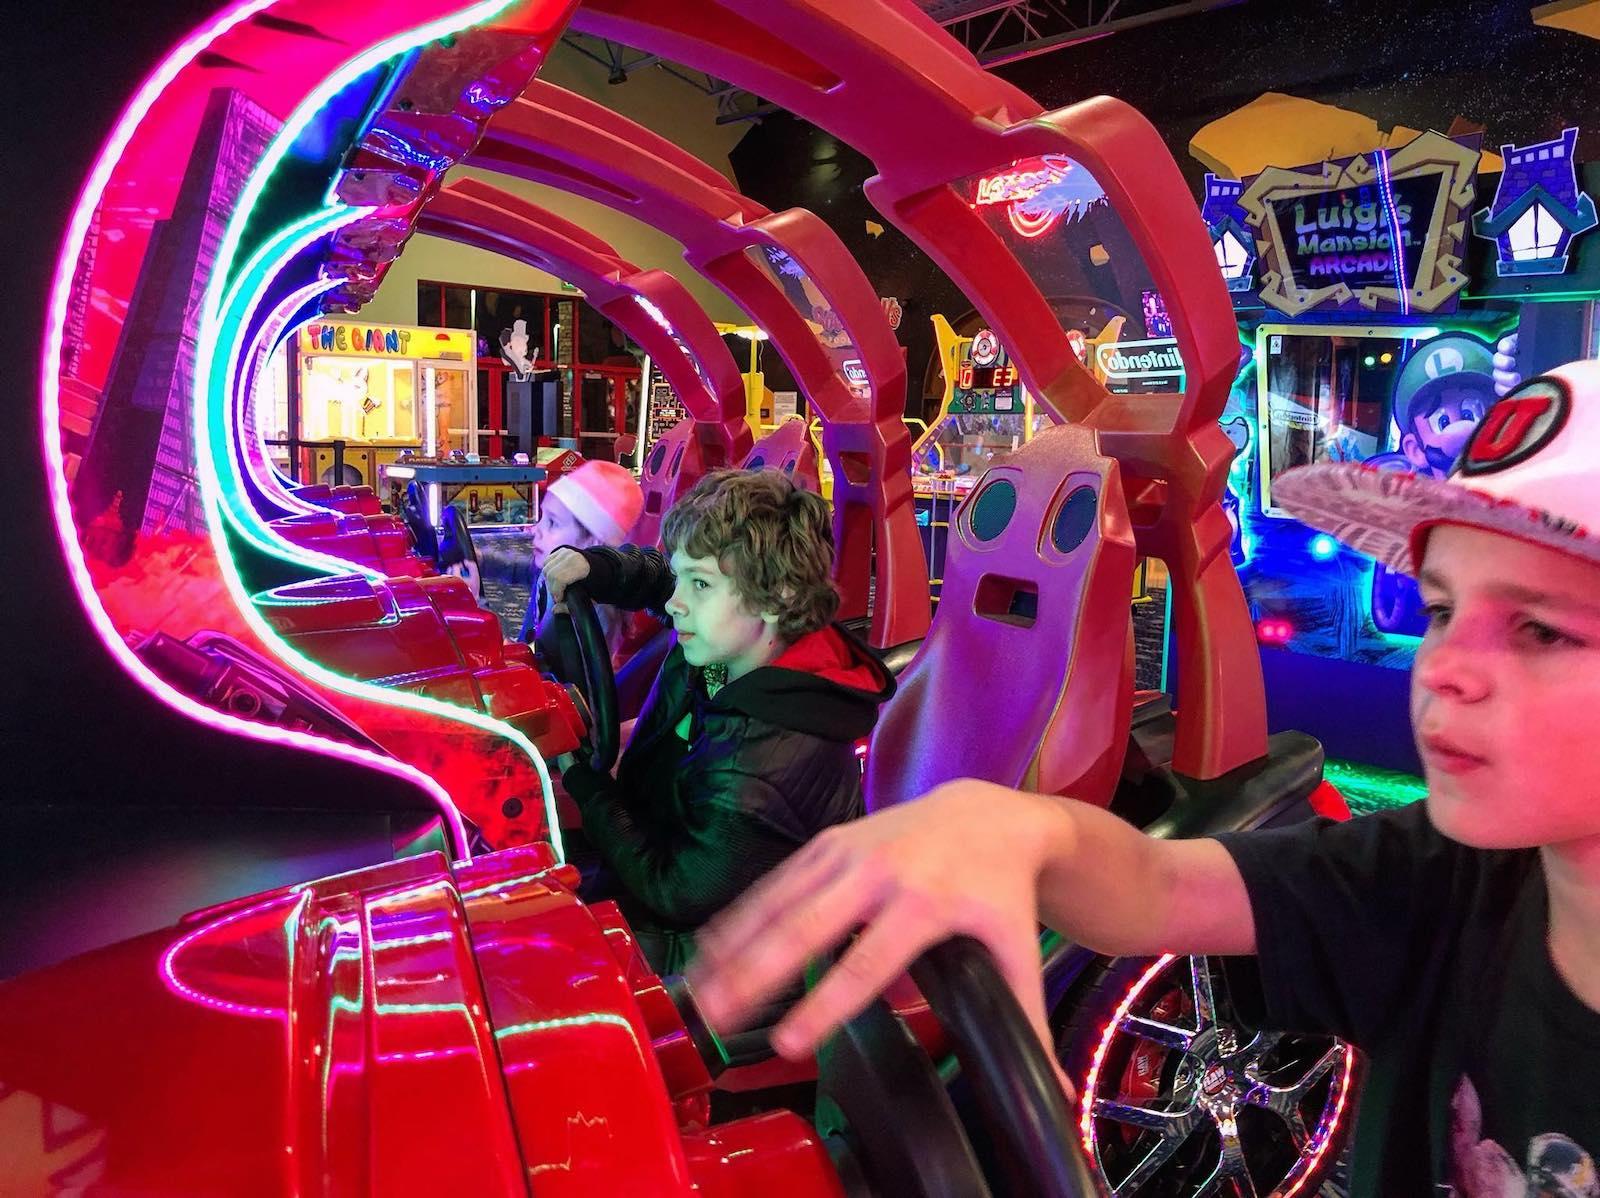 The Arcade in Boondocks Fun Center, CO